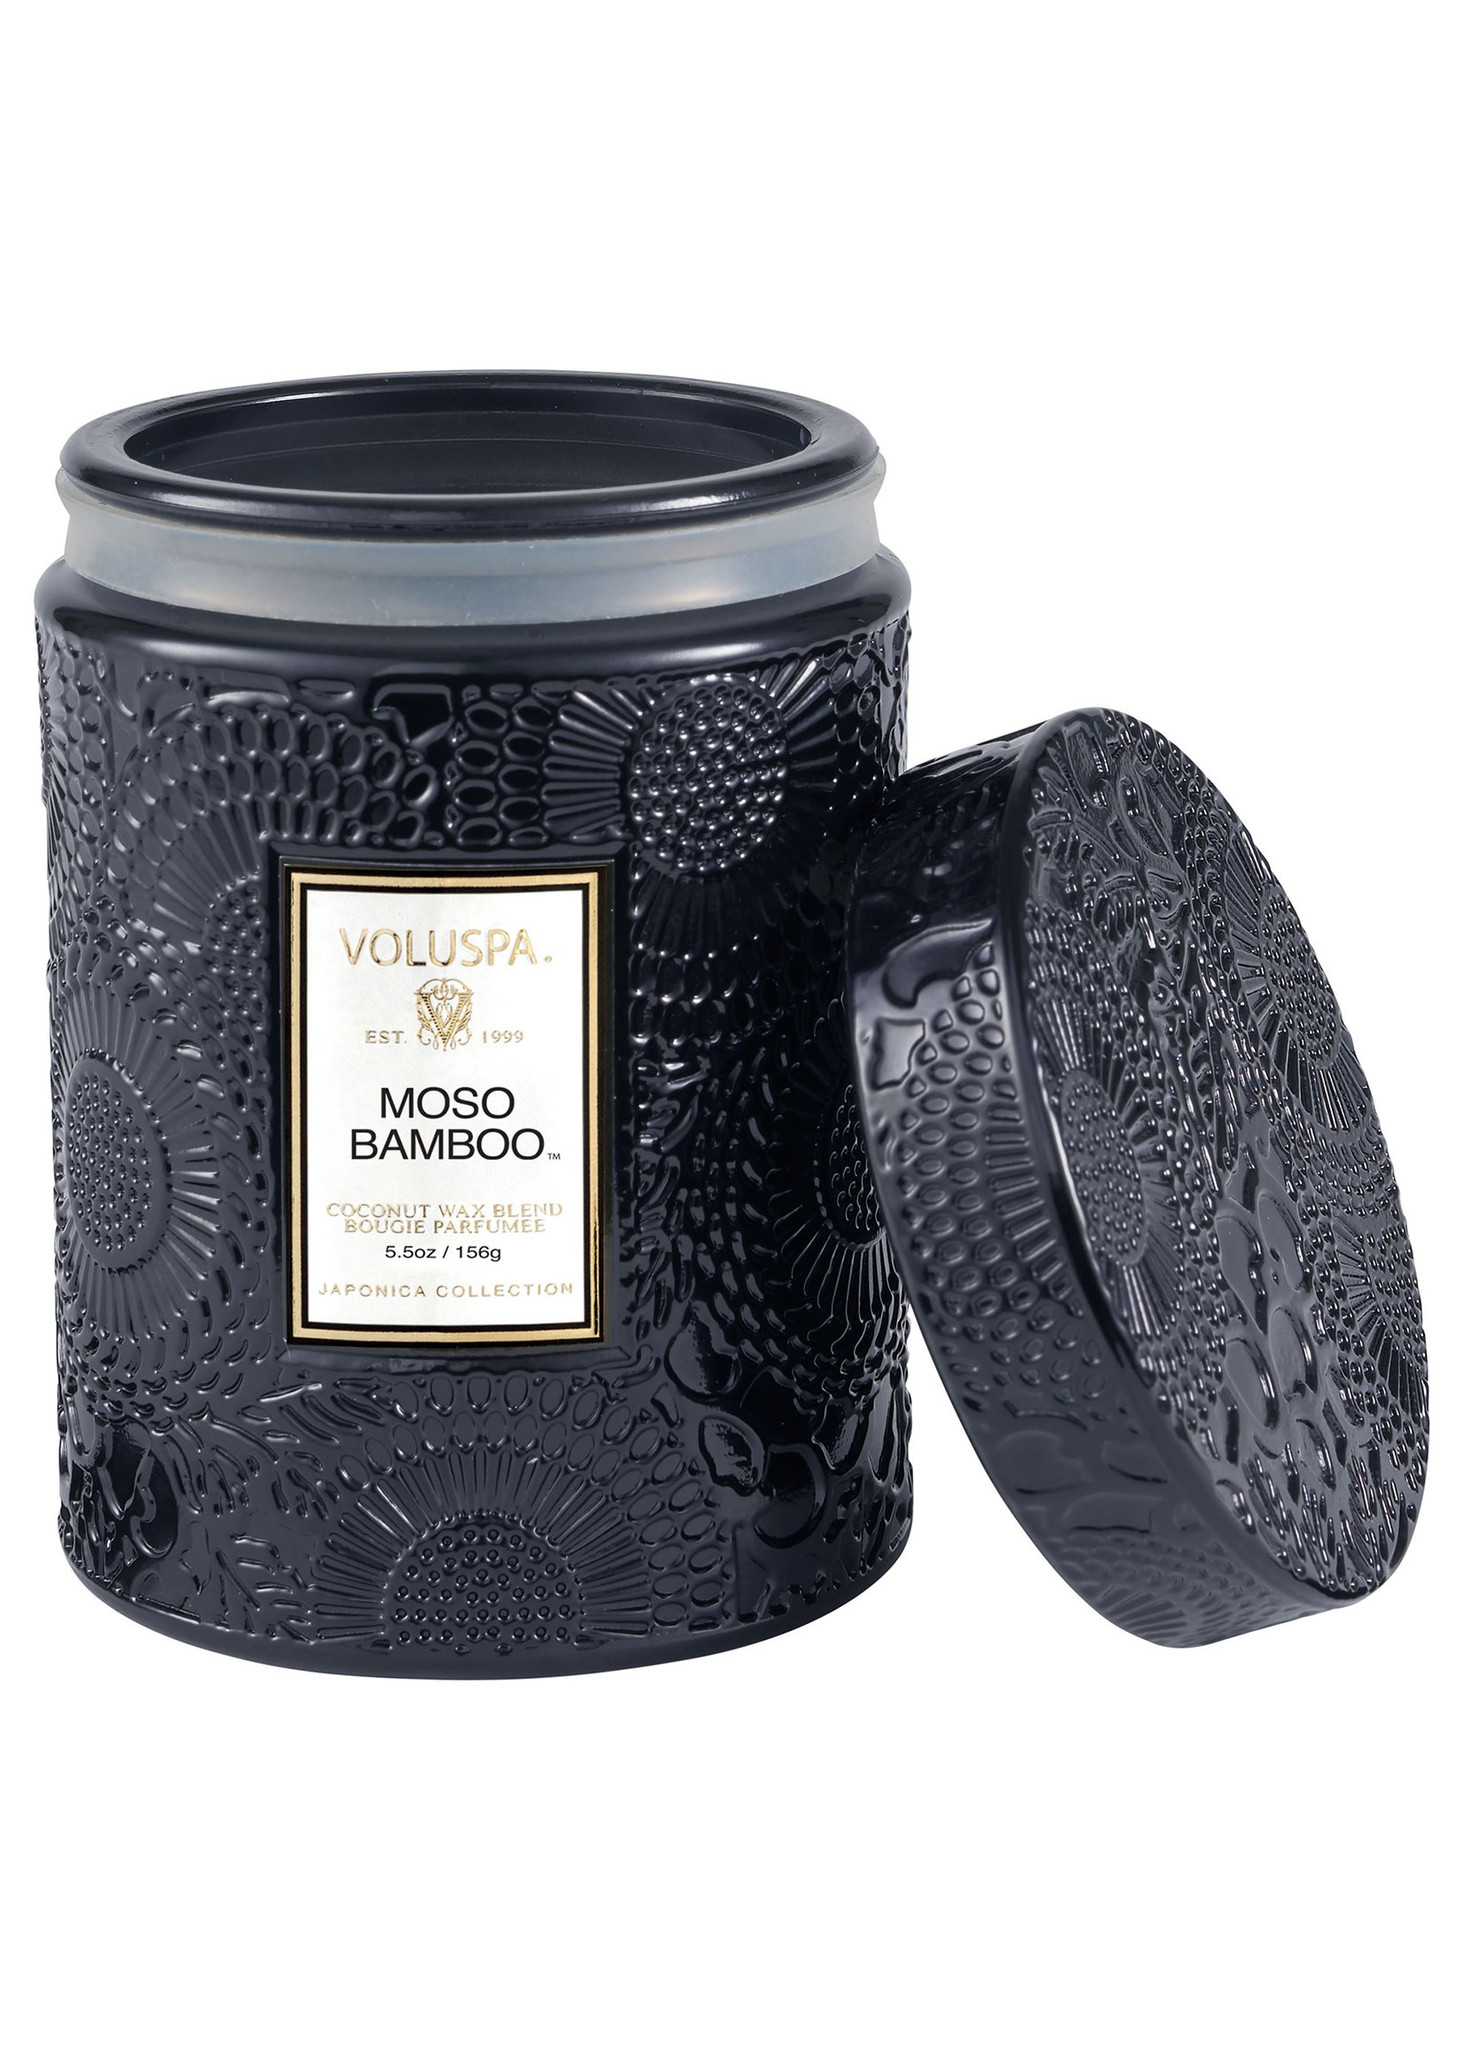 Moso Bamboo Small Jar Candle-2